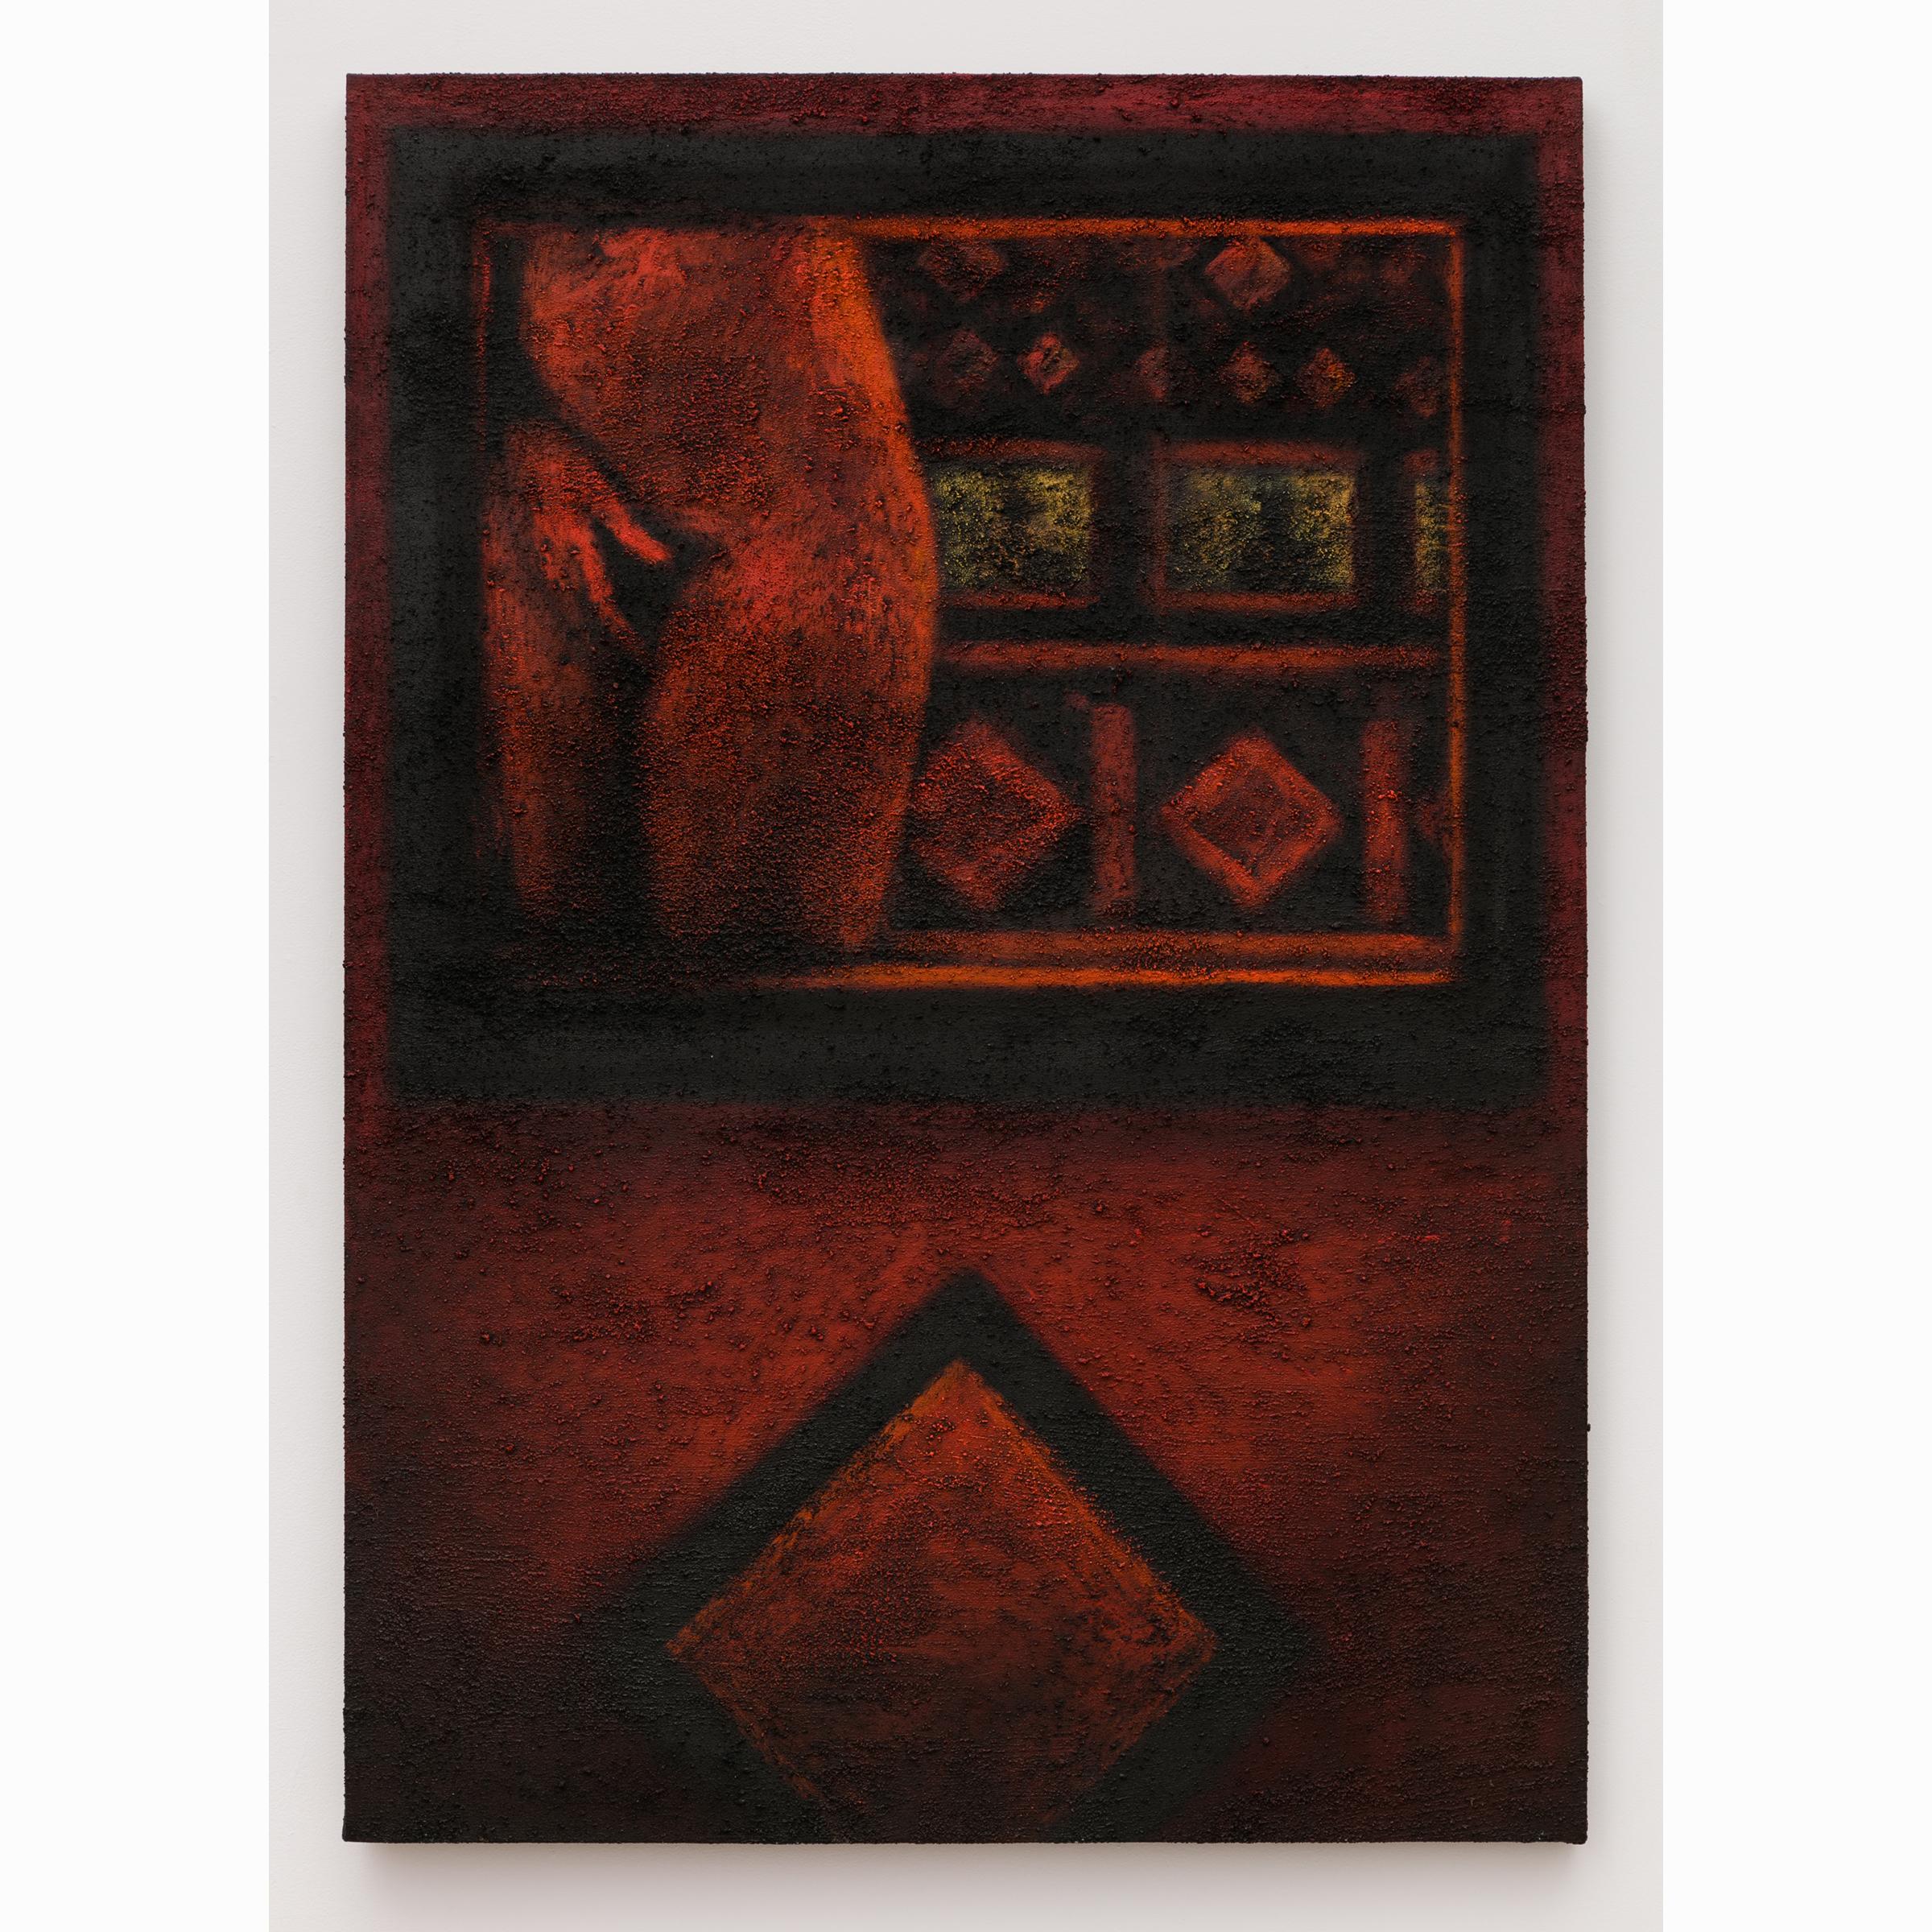 Jane Dickson, Peep 2 , 1992-1996,oil pummice on canvas,57 x 40 in,Courtesy the Artist